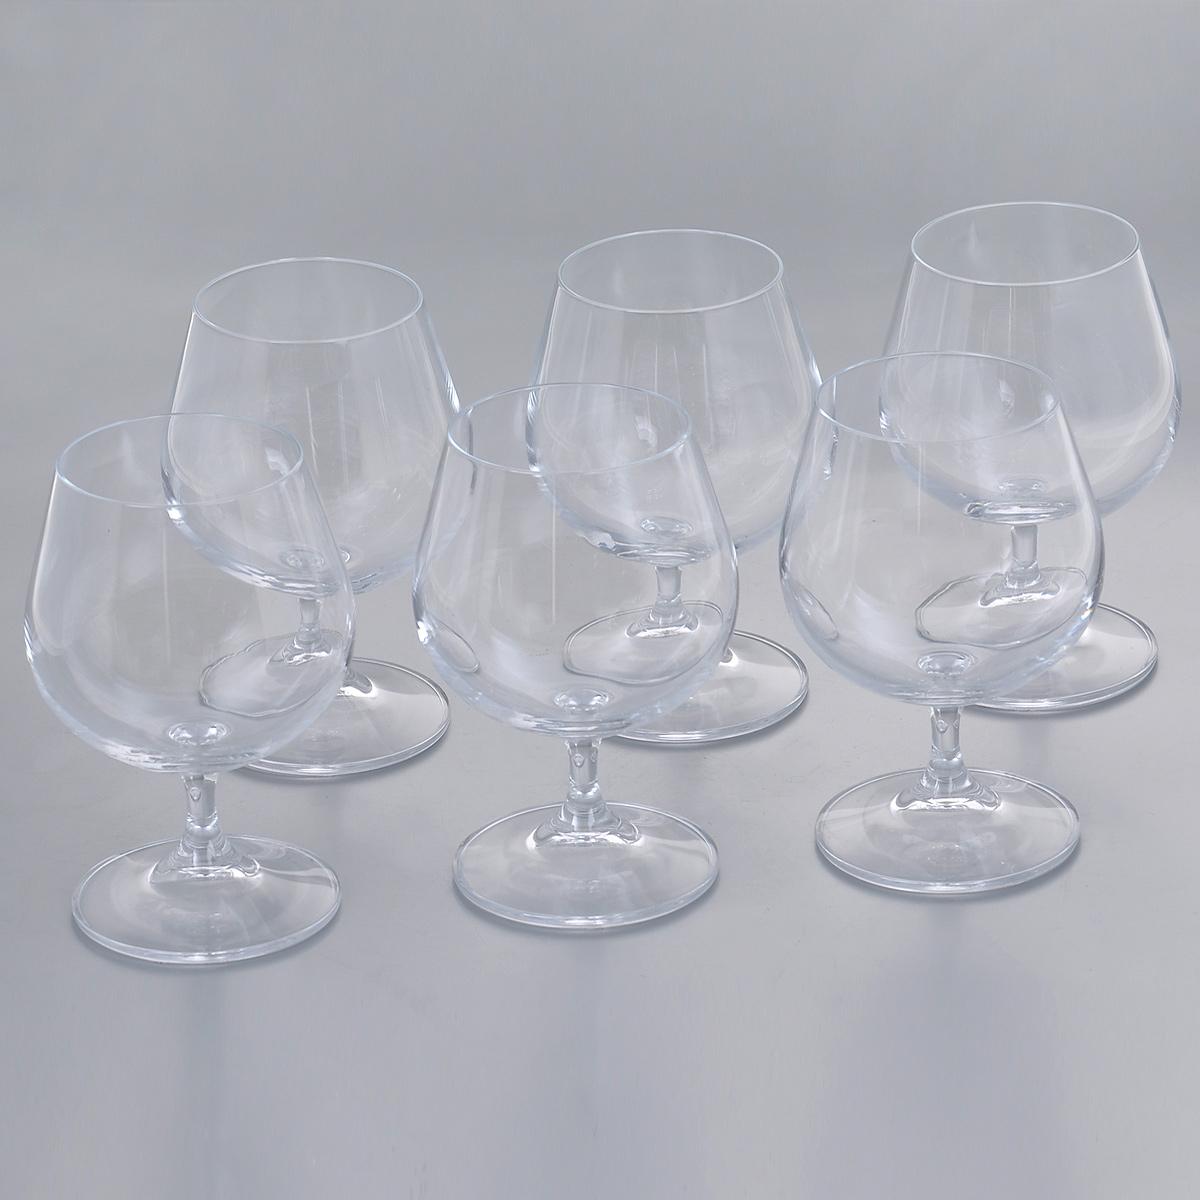 Набор бокалов для бренди Crystalite Bohemia Клара, 400 мл, 6 шт набор бокалов для бренди 6 шт crystalite bohemia набор бокалов для бренди 6 шт